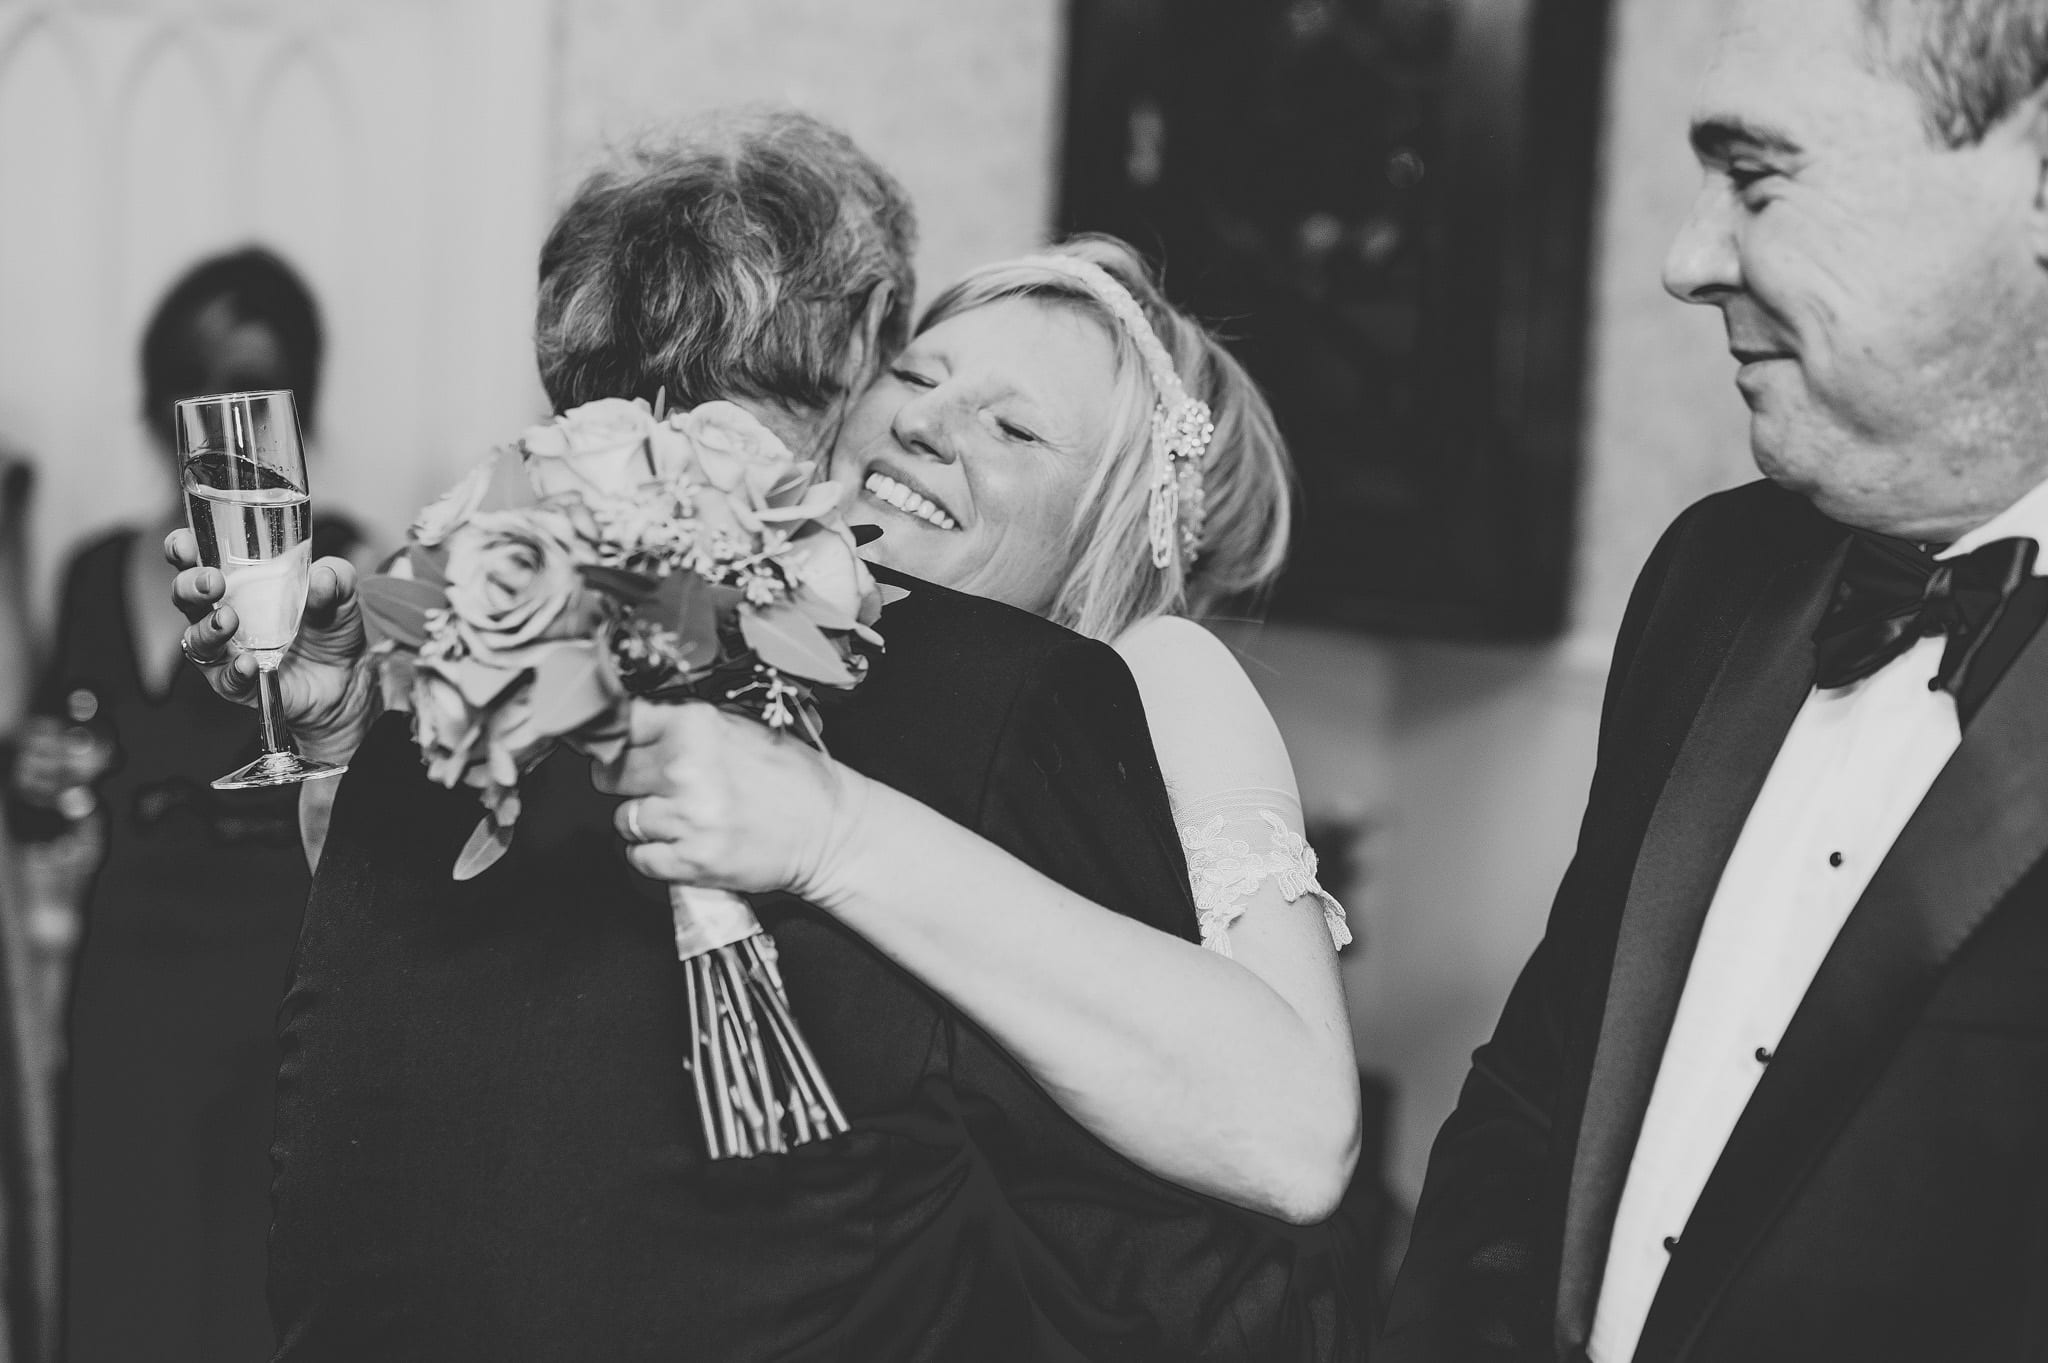 wedding photography midlands 99 - Midlands wedding photography - 2015 Review